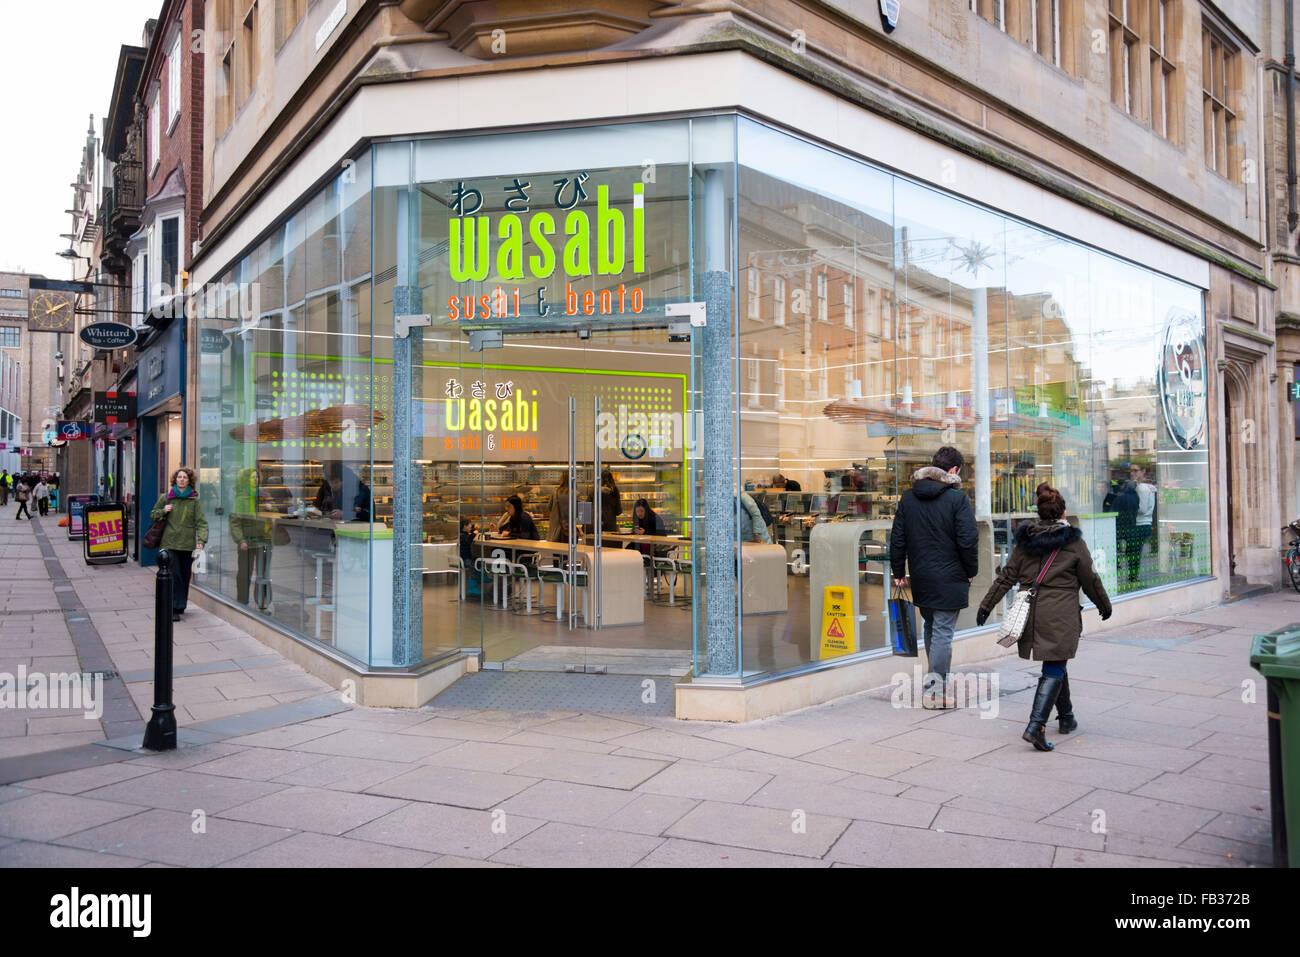 Wasabi japanese restaurant coupons